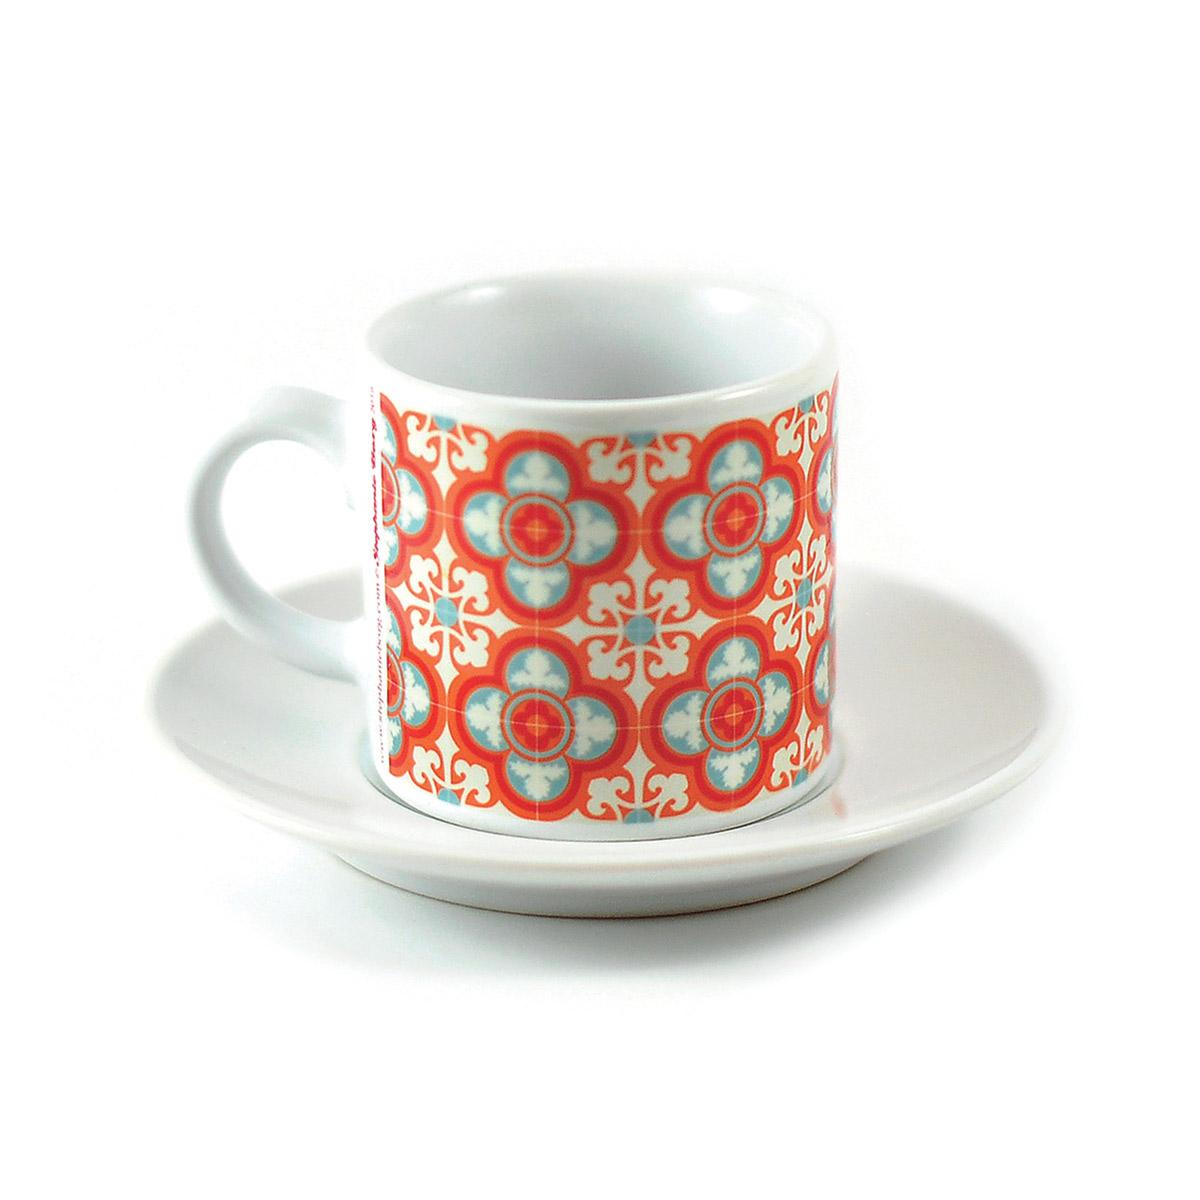 Malta Tile Espresso Cup & Saucer, pattern no.5